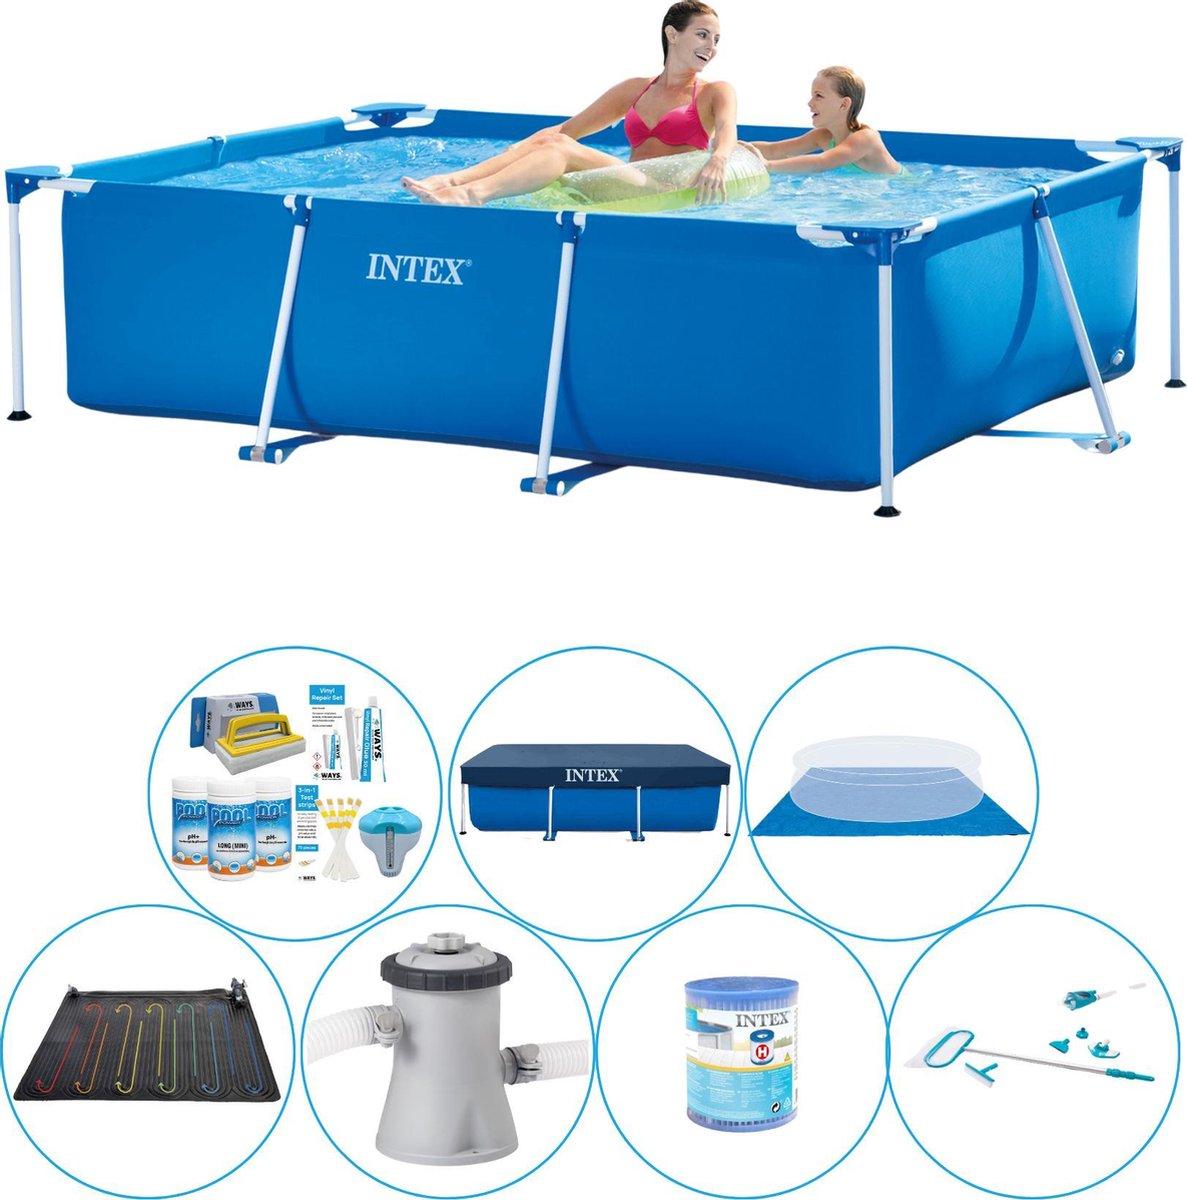 Intex Frame Pool Rechthoekig 220x150x60 cm - Zwembad Set